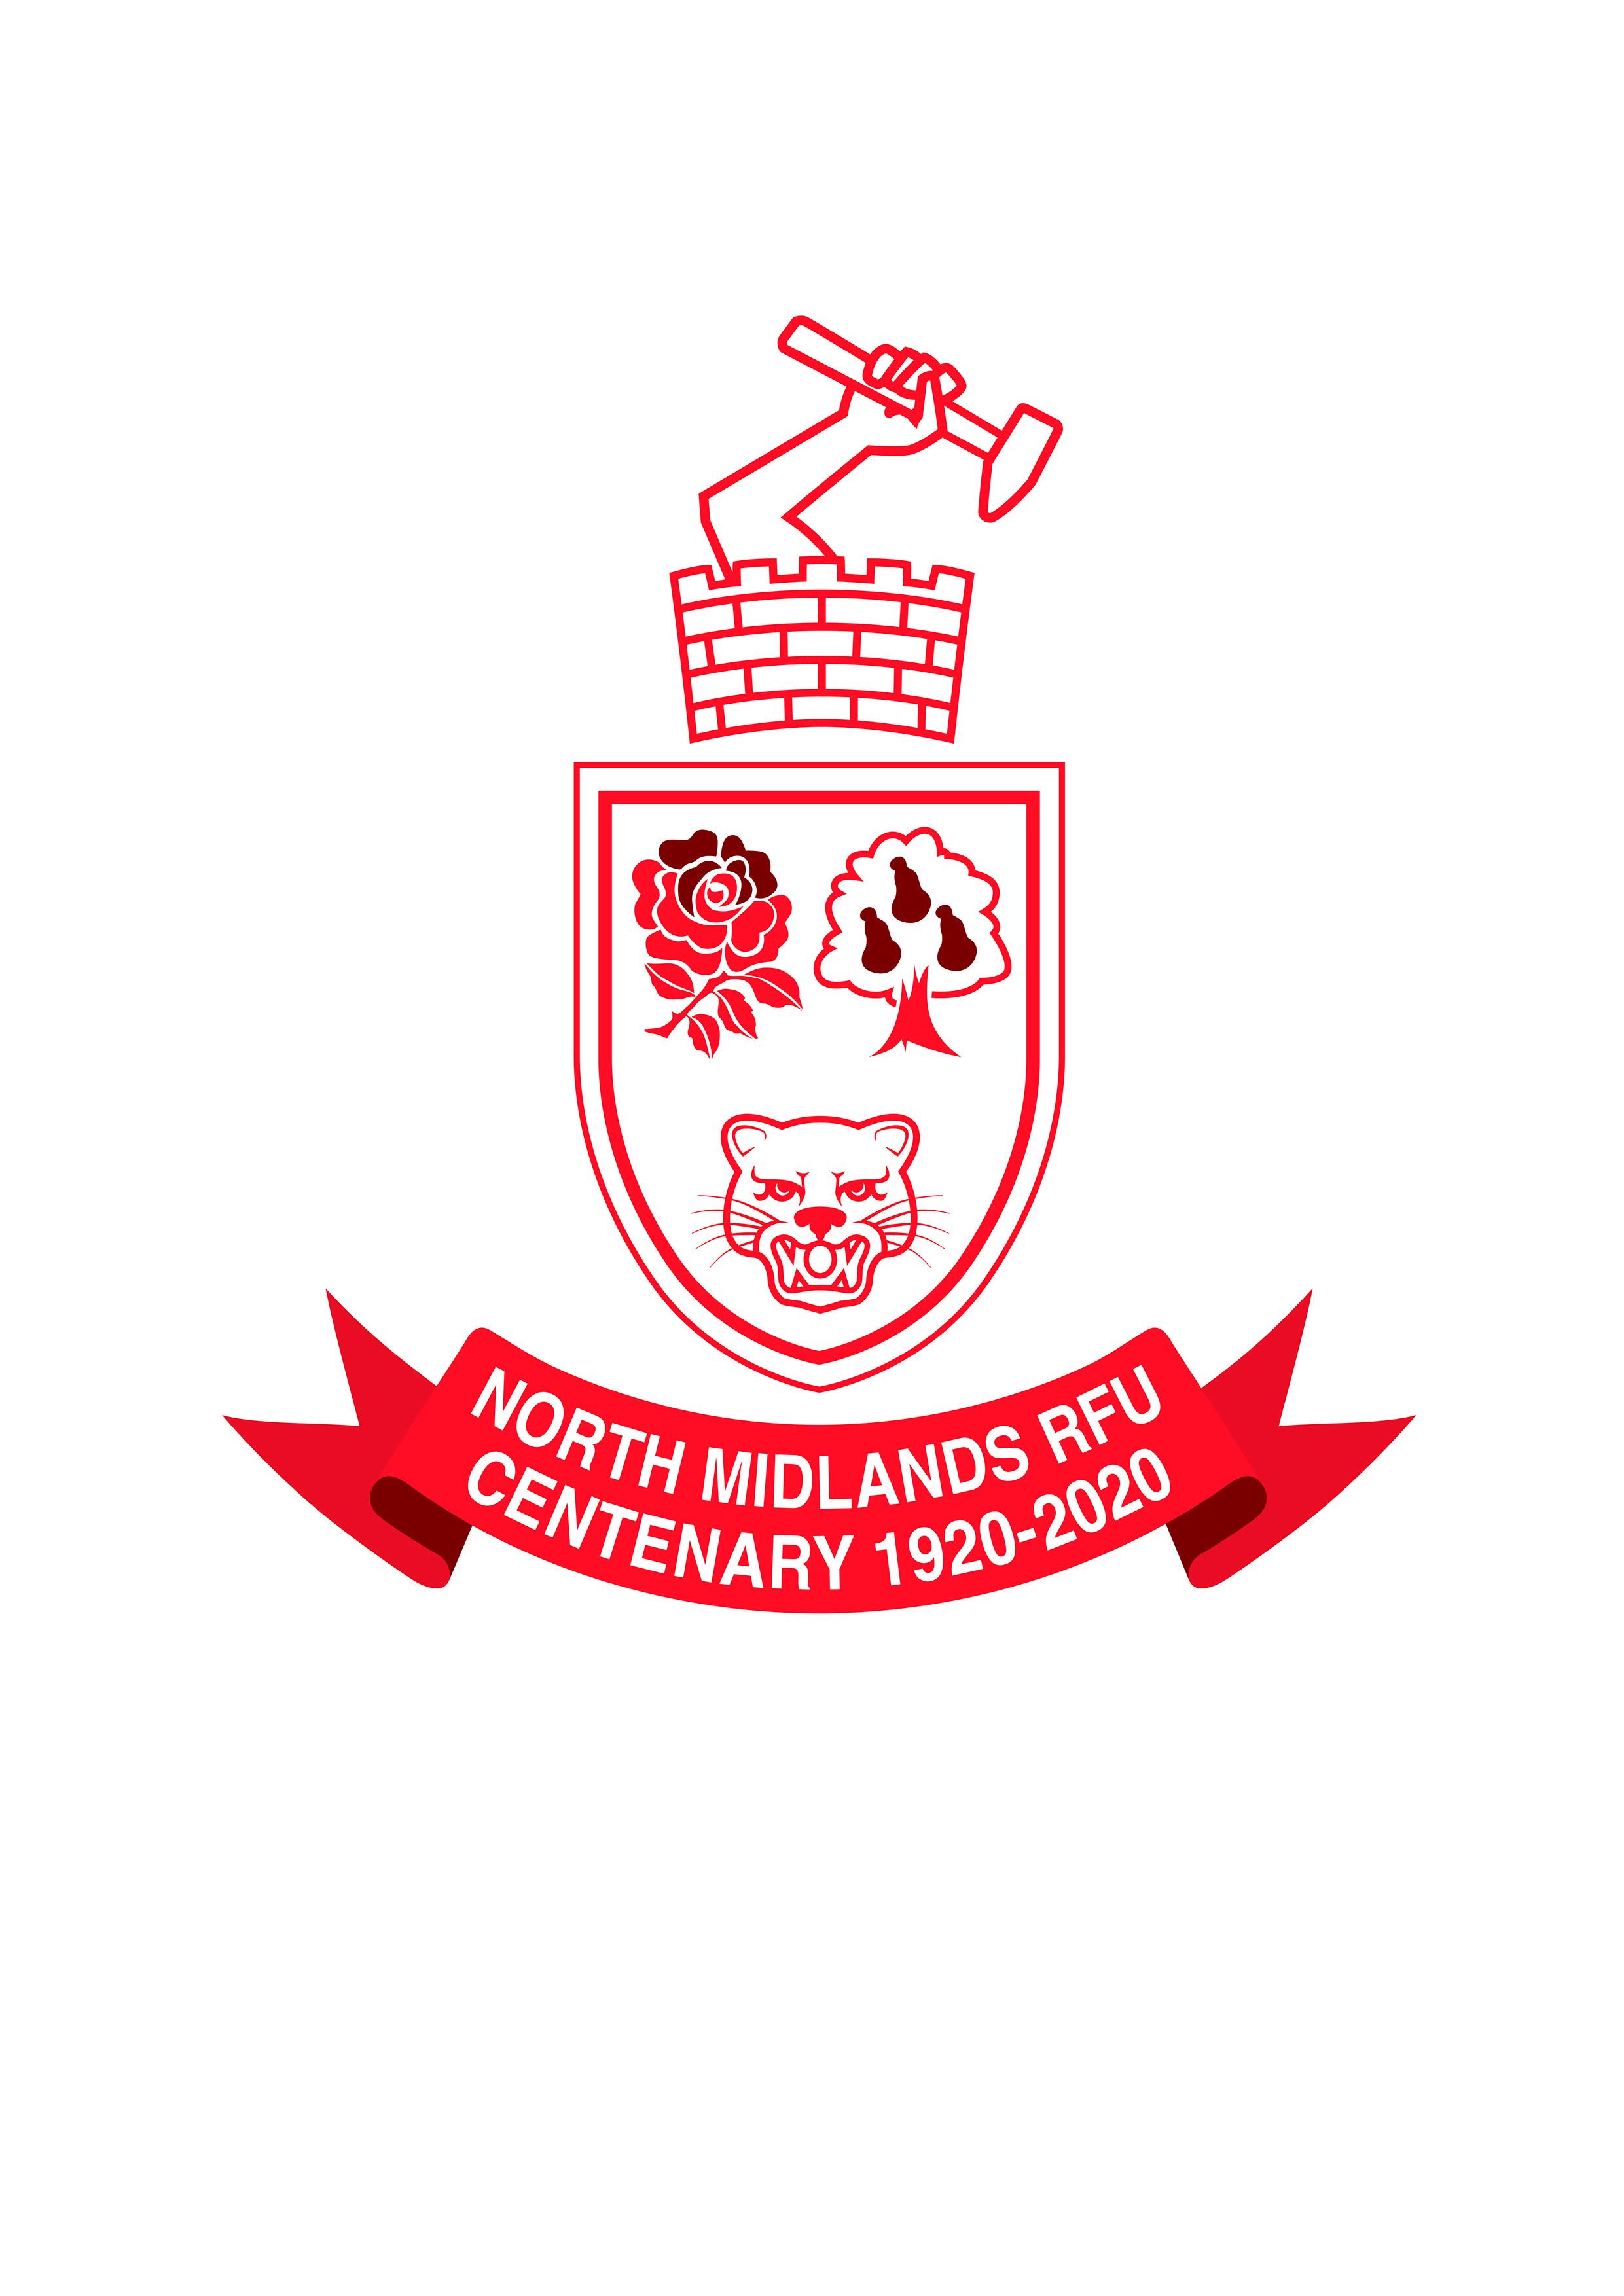 98542_North Midlands Rugby Football Union_Centenary Logo_CH v3